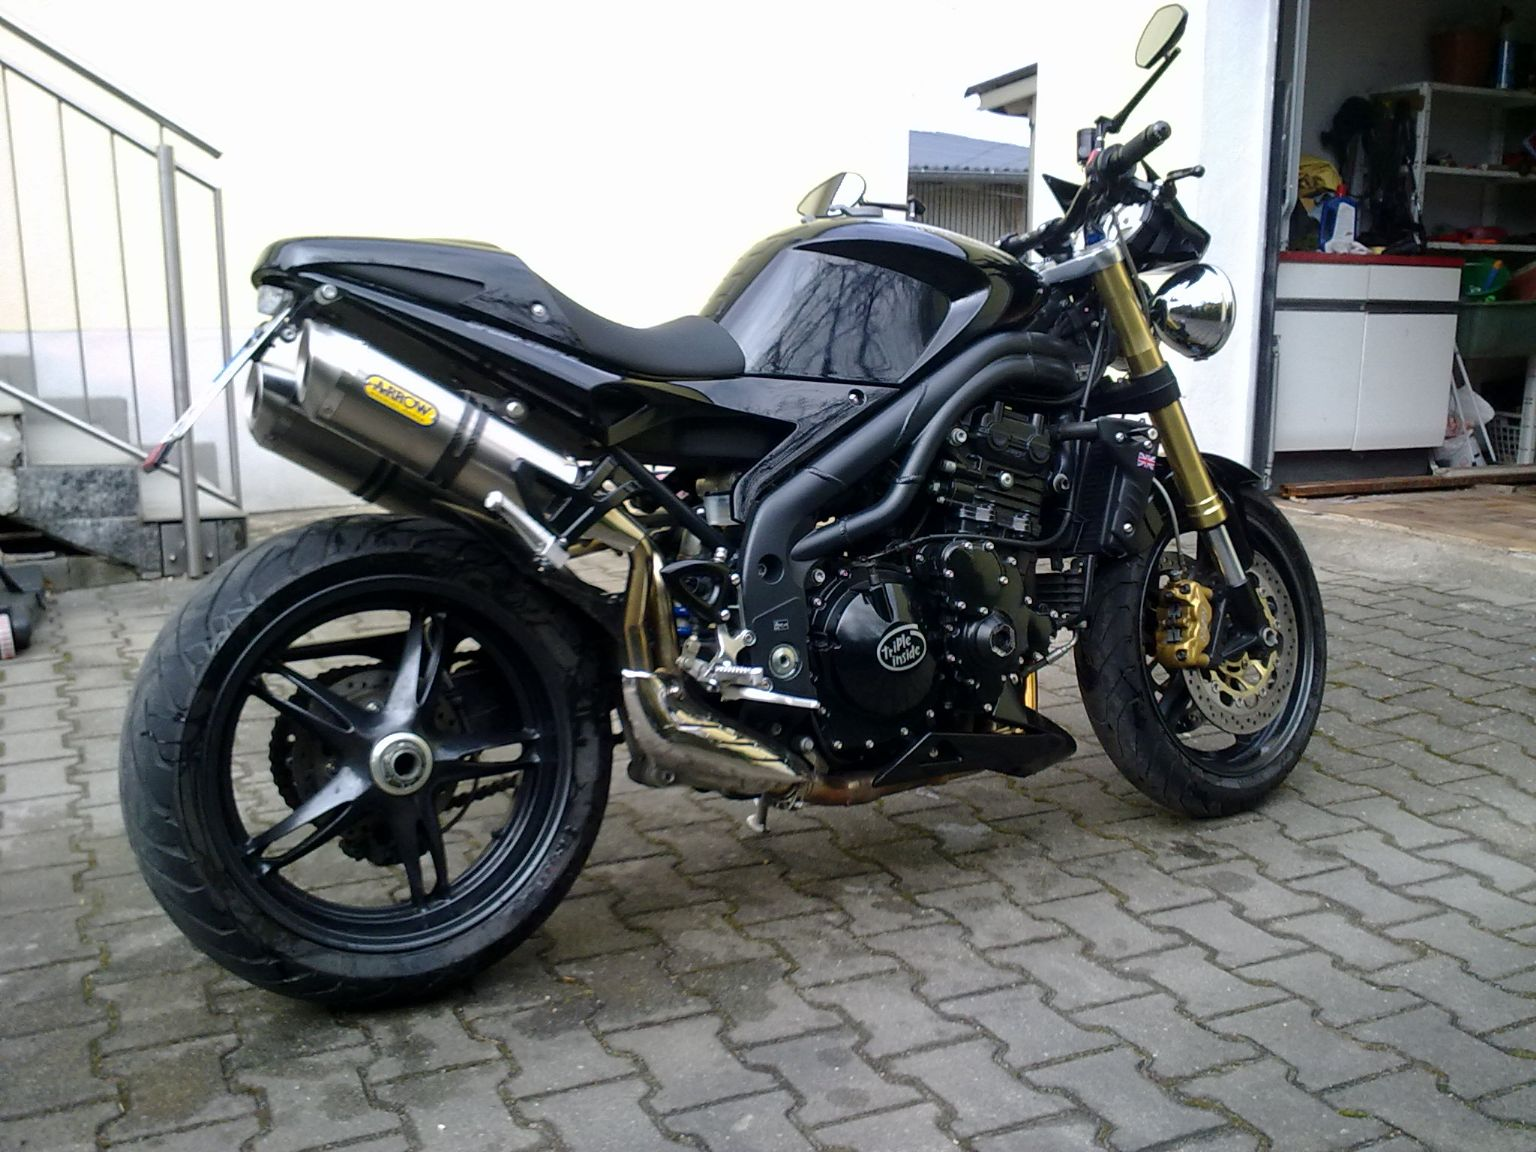 Umgebautes Motorrad Triumph Speed Triple 1050 von